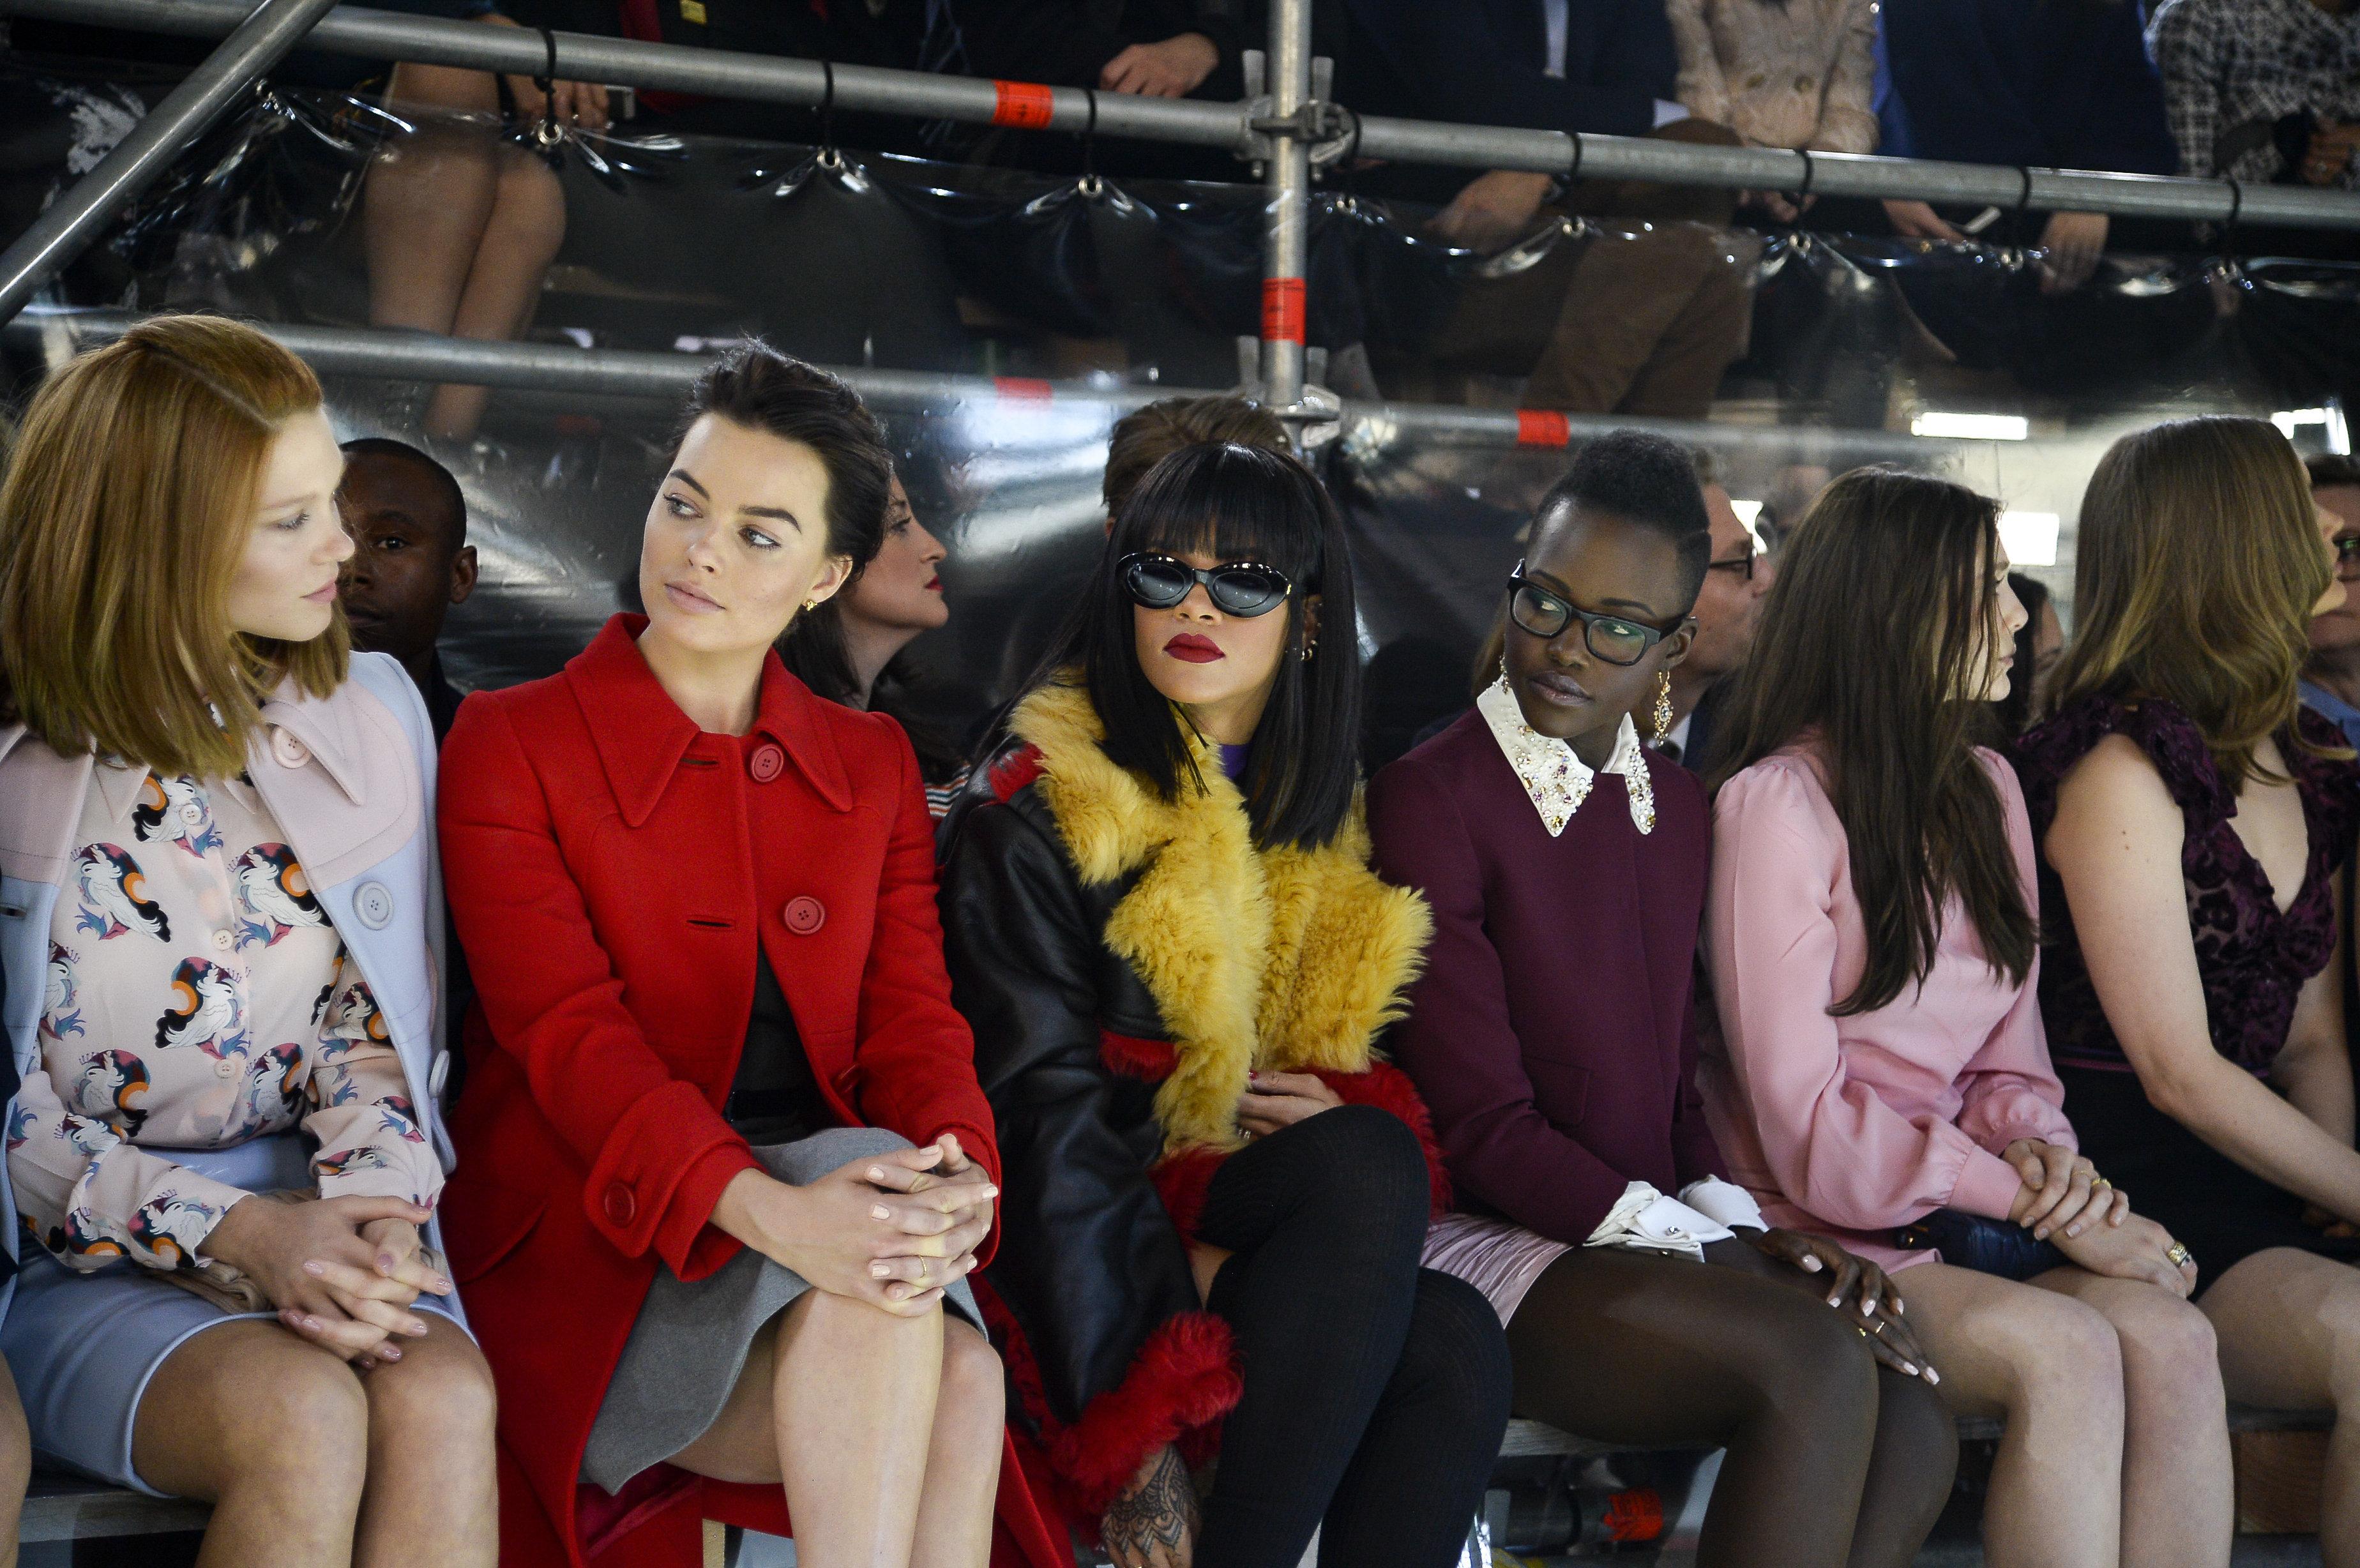 Rihanna and Lupita Nyong'o attend the Miu Miu show during Paris Fashion Week on March 5, 2014.